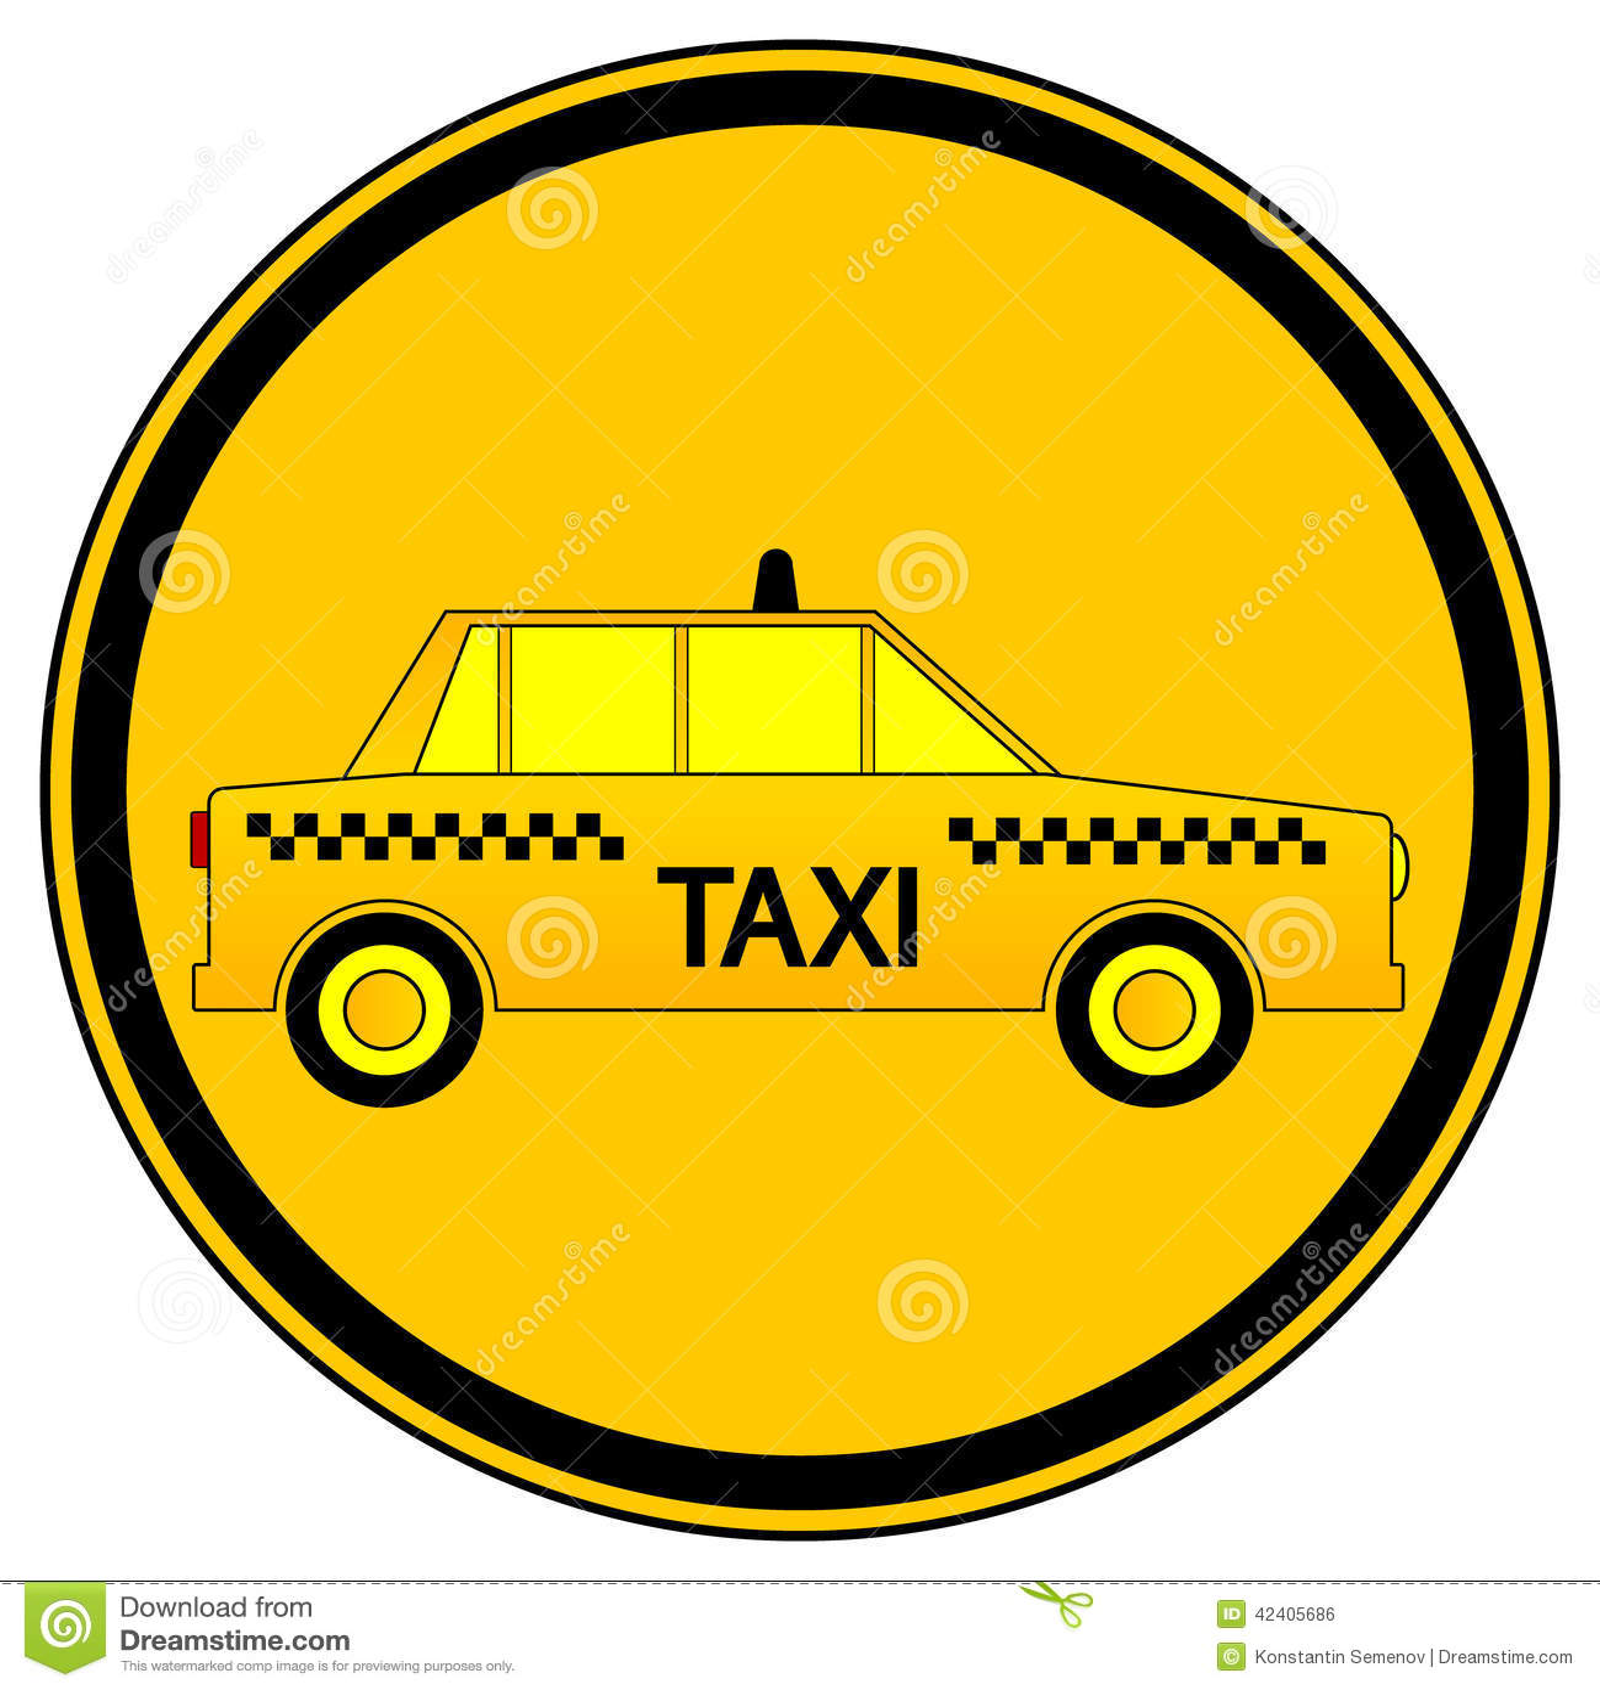 taxi car button stock vector image 42405686. Black Bedroom Furniture Sets. Home Design Ideas